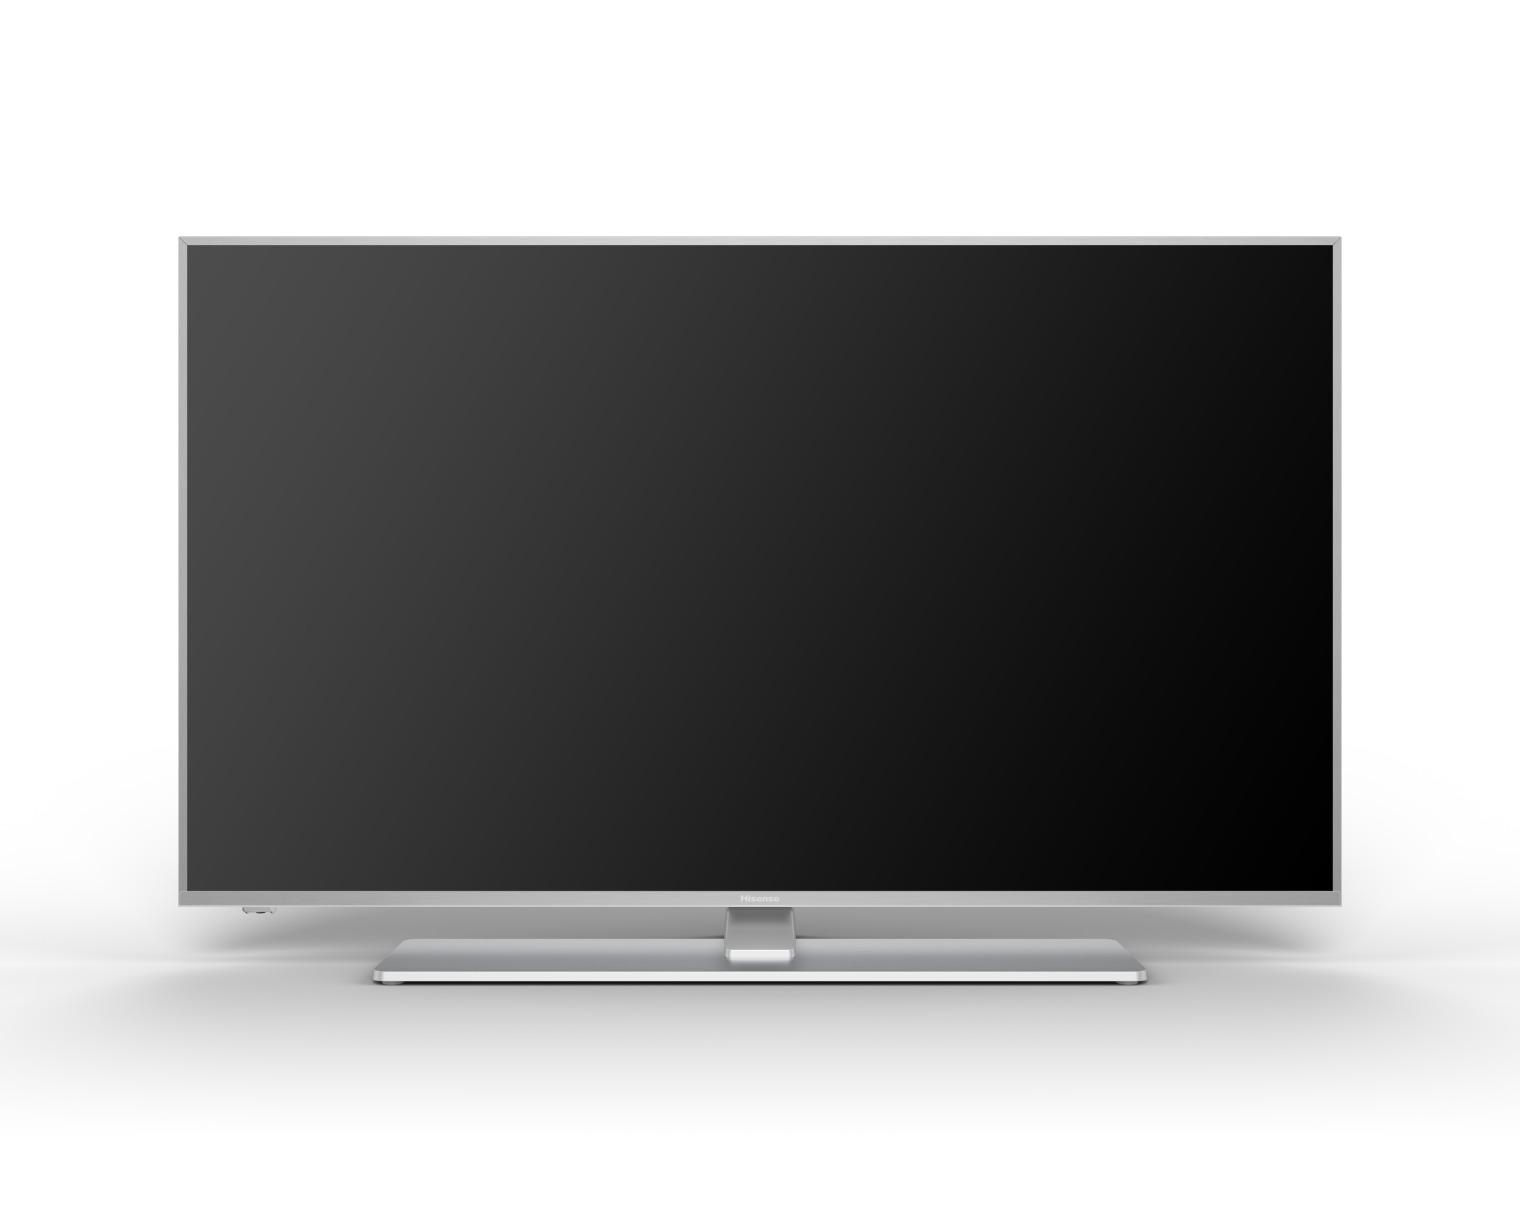 HISENSE UHD TV H50A6550/NL ZILVER